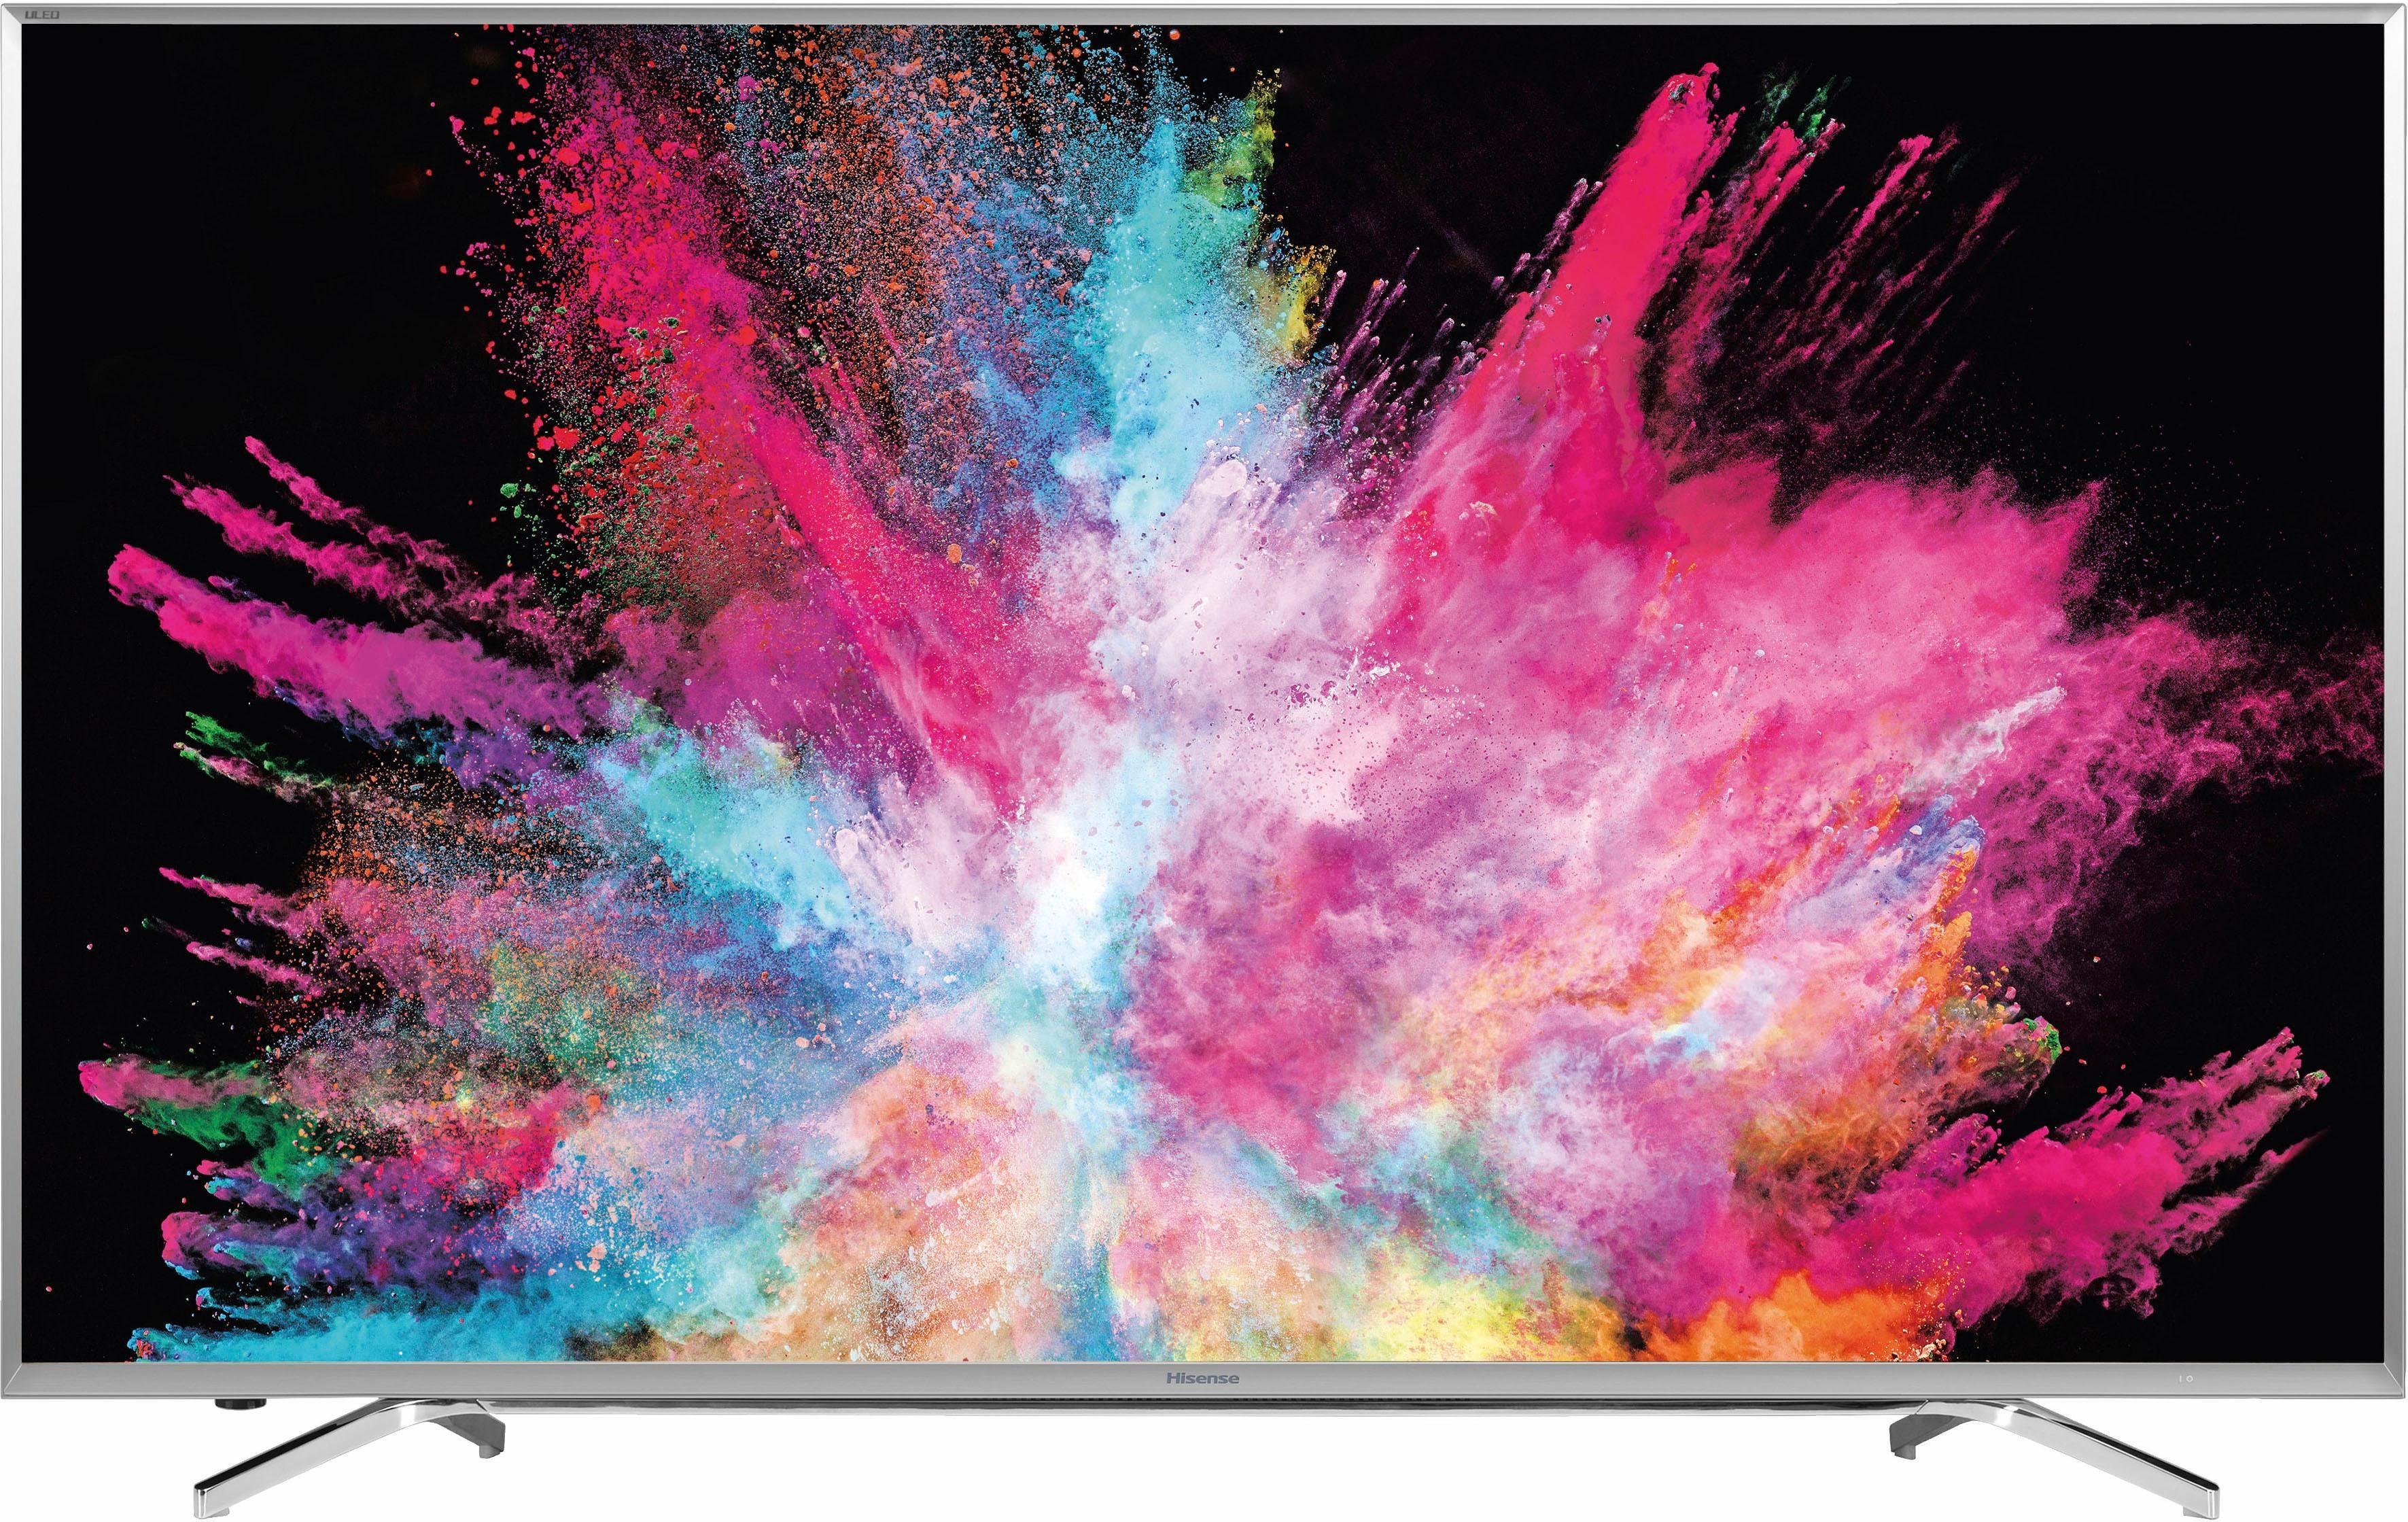 Hisense H55M7000, LED Fernseher, 138 cm (55 Zoll), 2160p (4K Ultra HD), Smart-TV